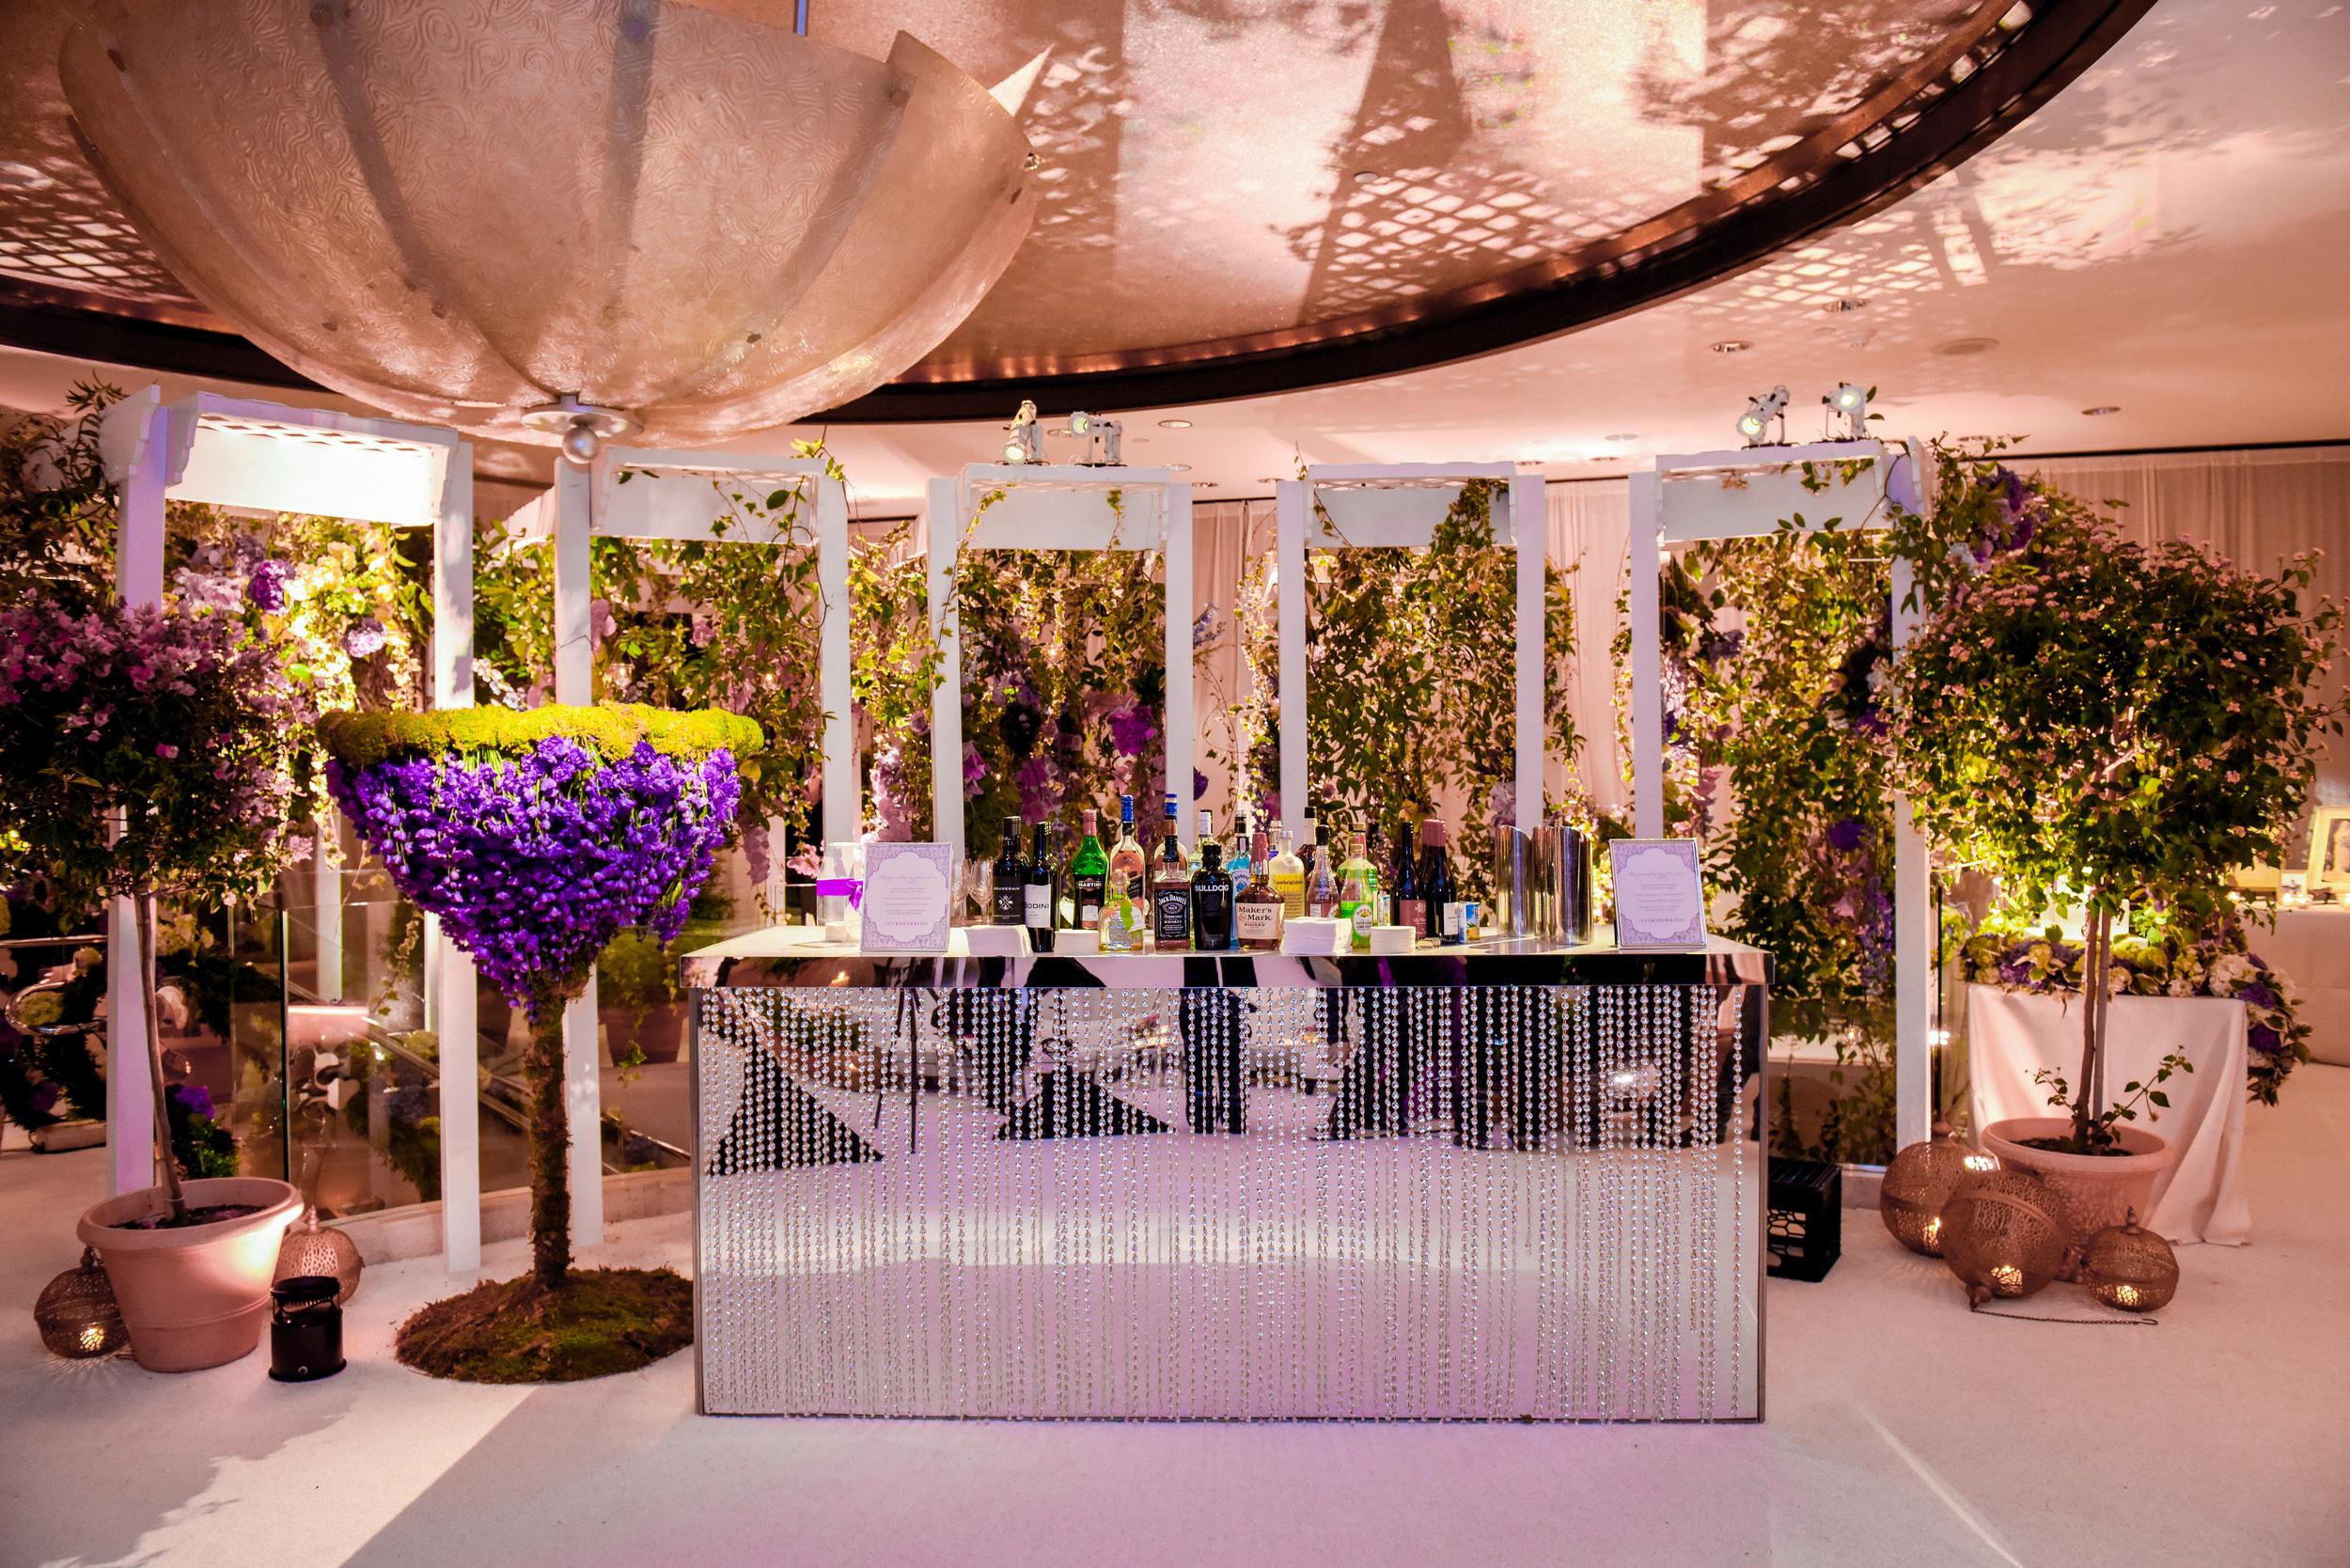 mandarin_oriental_new_york_city_branding_inspiration_lavender_silver_wedding_floral_purple_v284_26.jpg